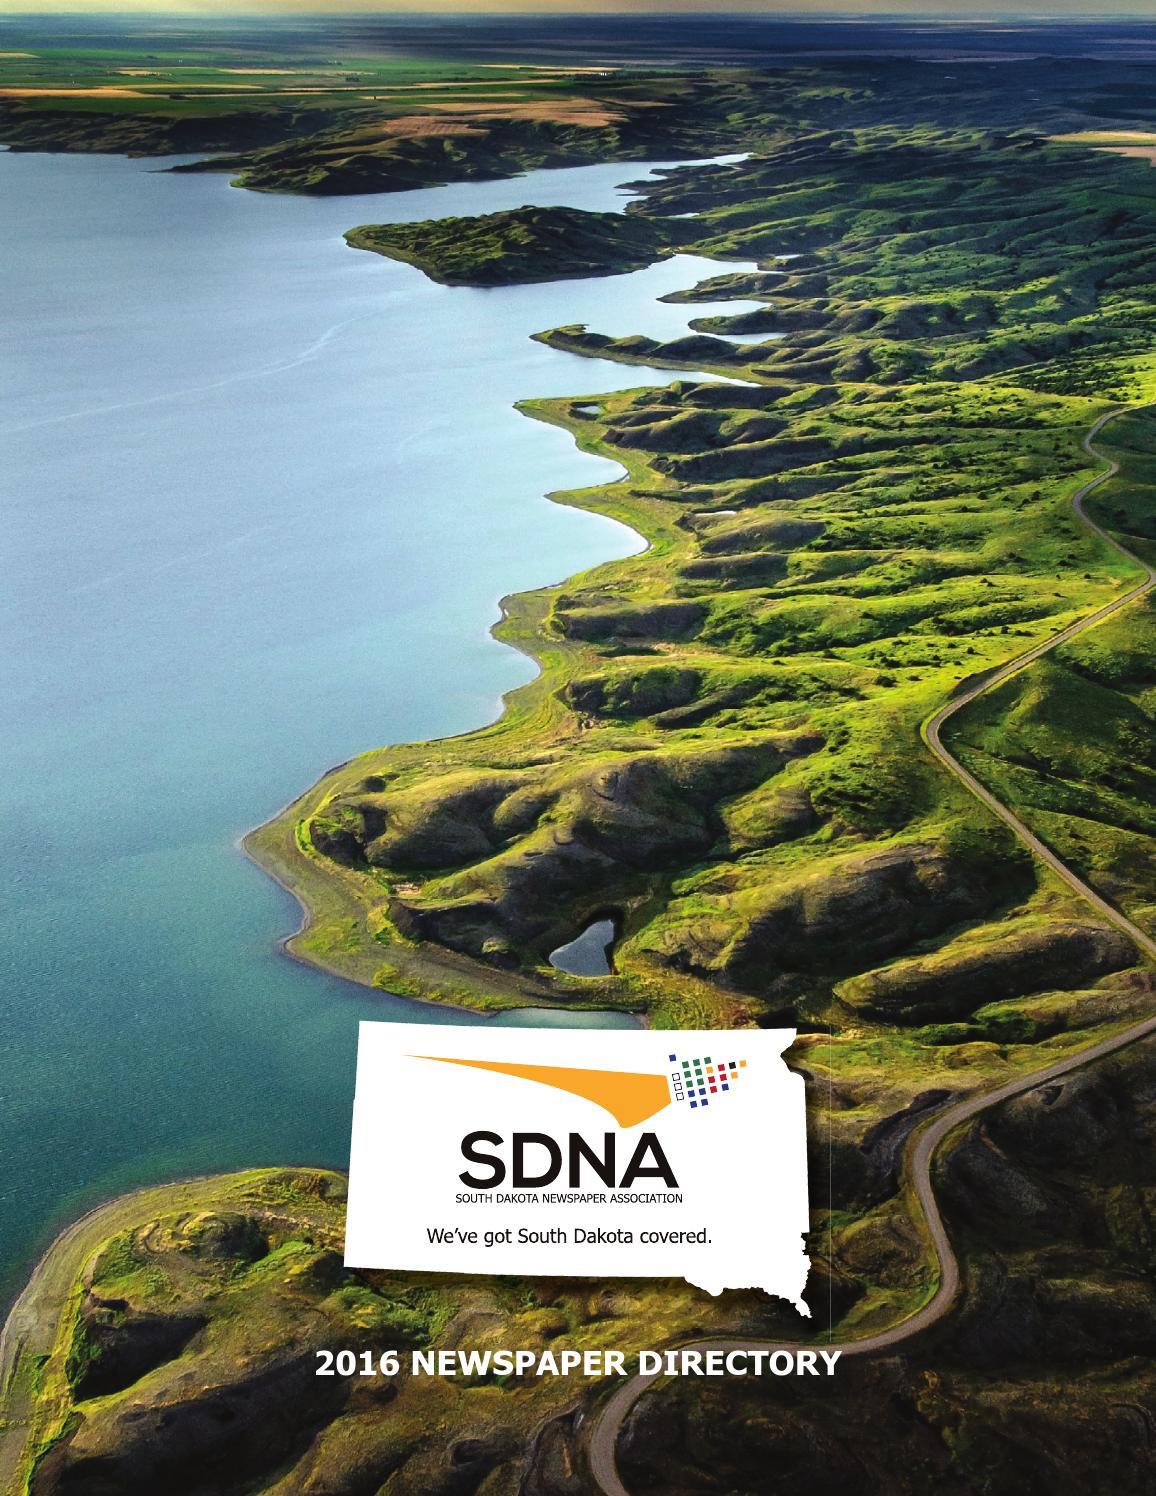 South dakota spink county doland - 2016 Sd Newspaper Directory By South Dakota Newspaper Association Issuu